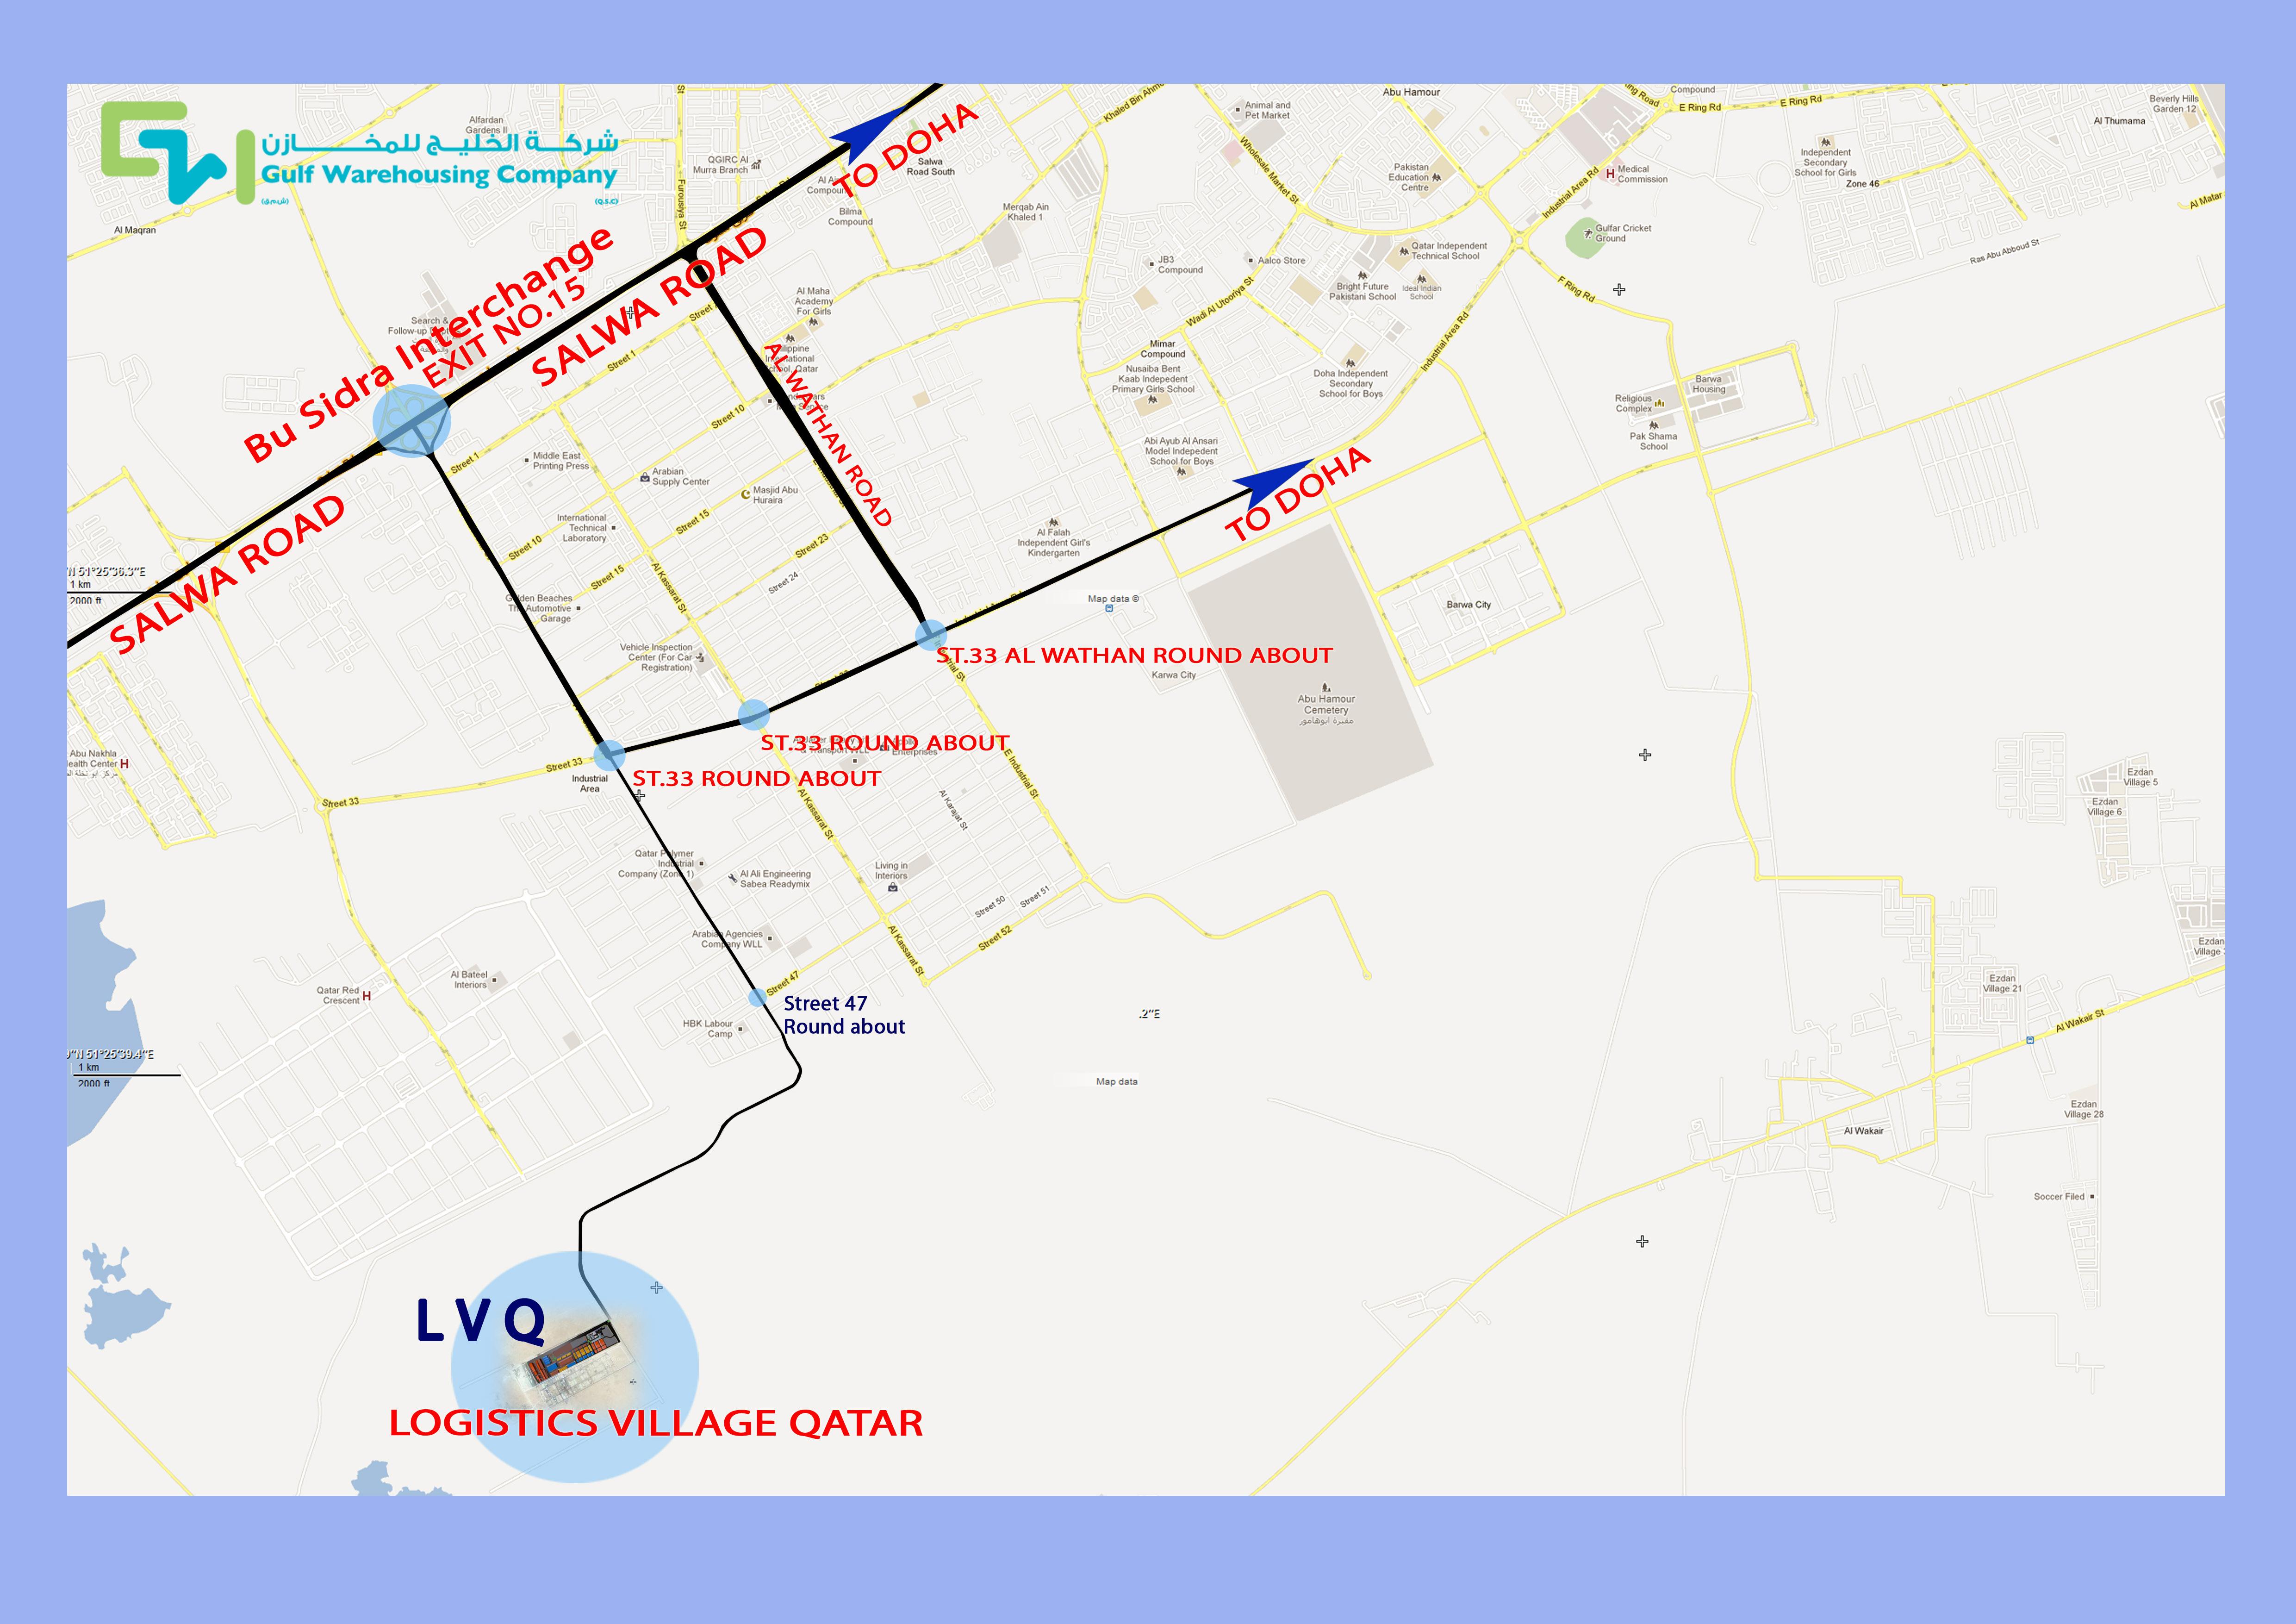 Oil Field Supply Companies In Qatar